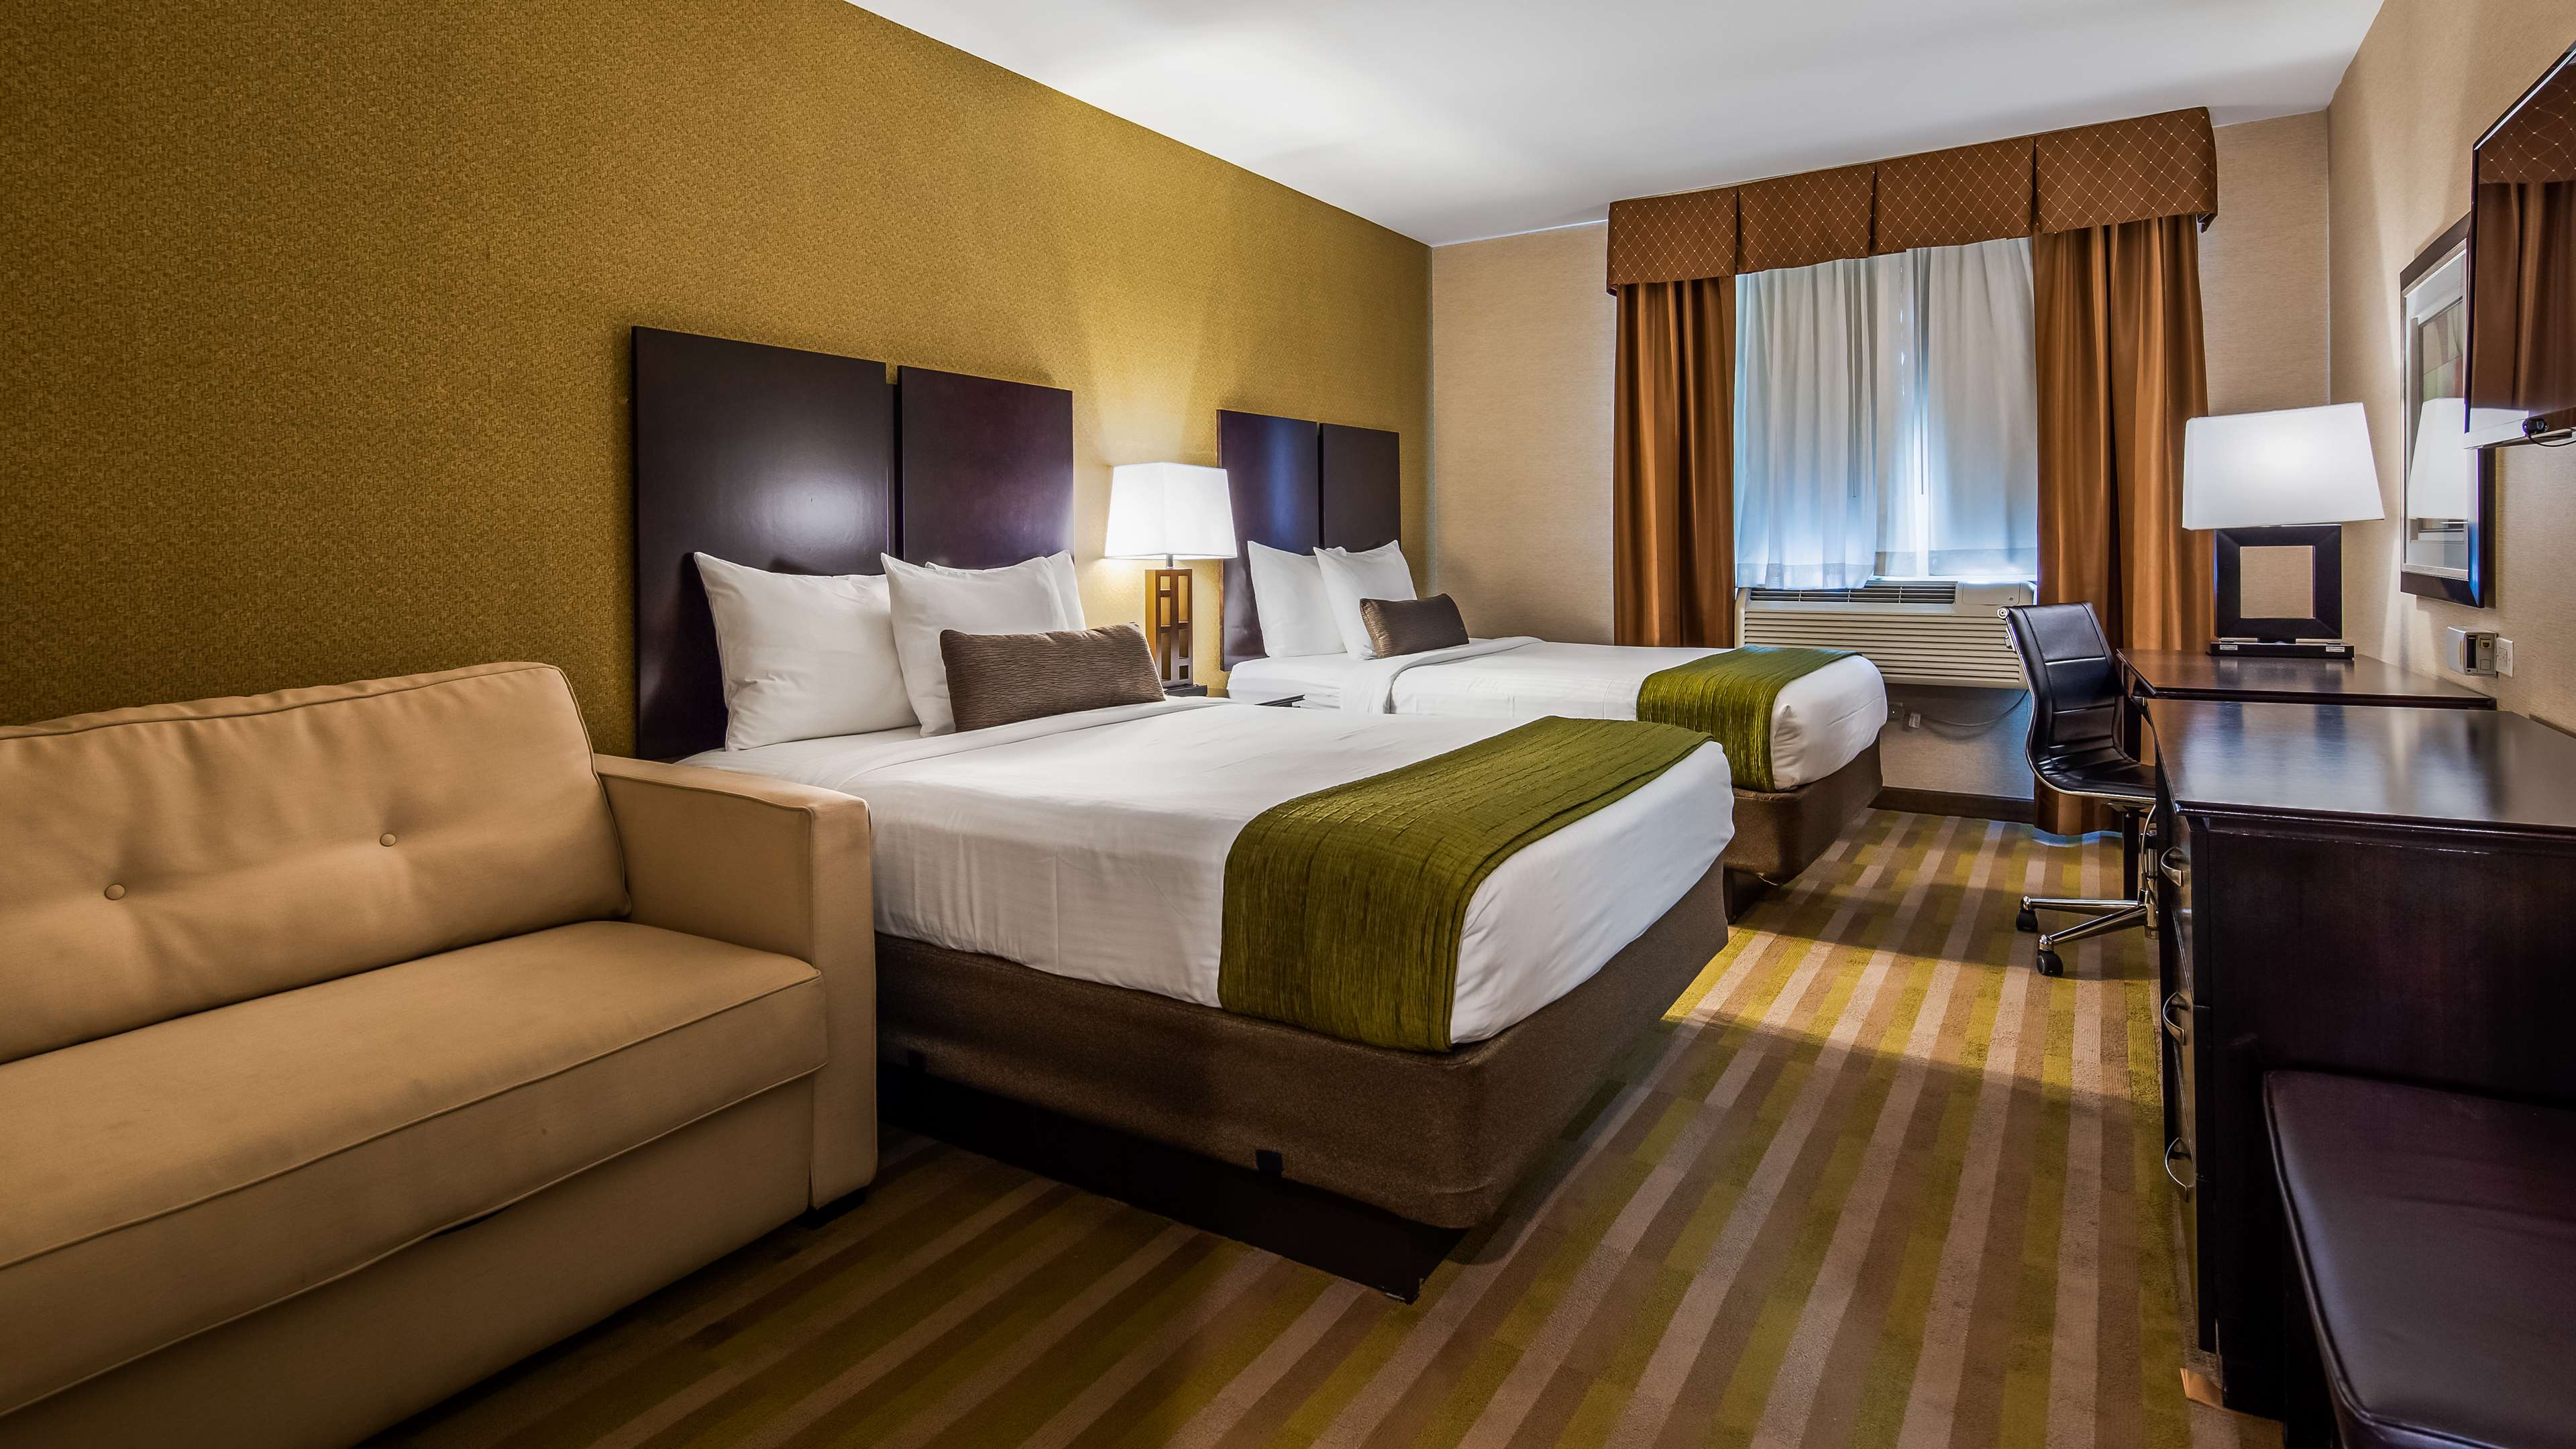 Best Western Plus Plaza Hotel image 22